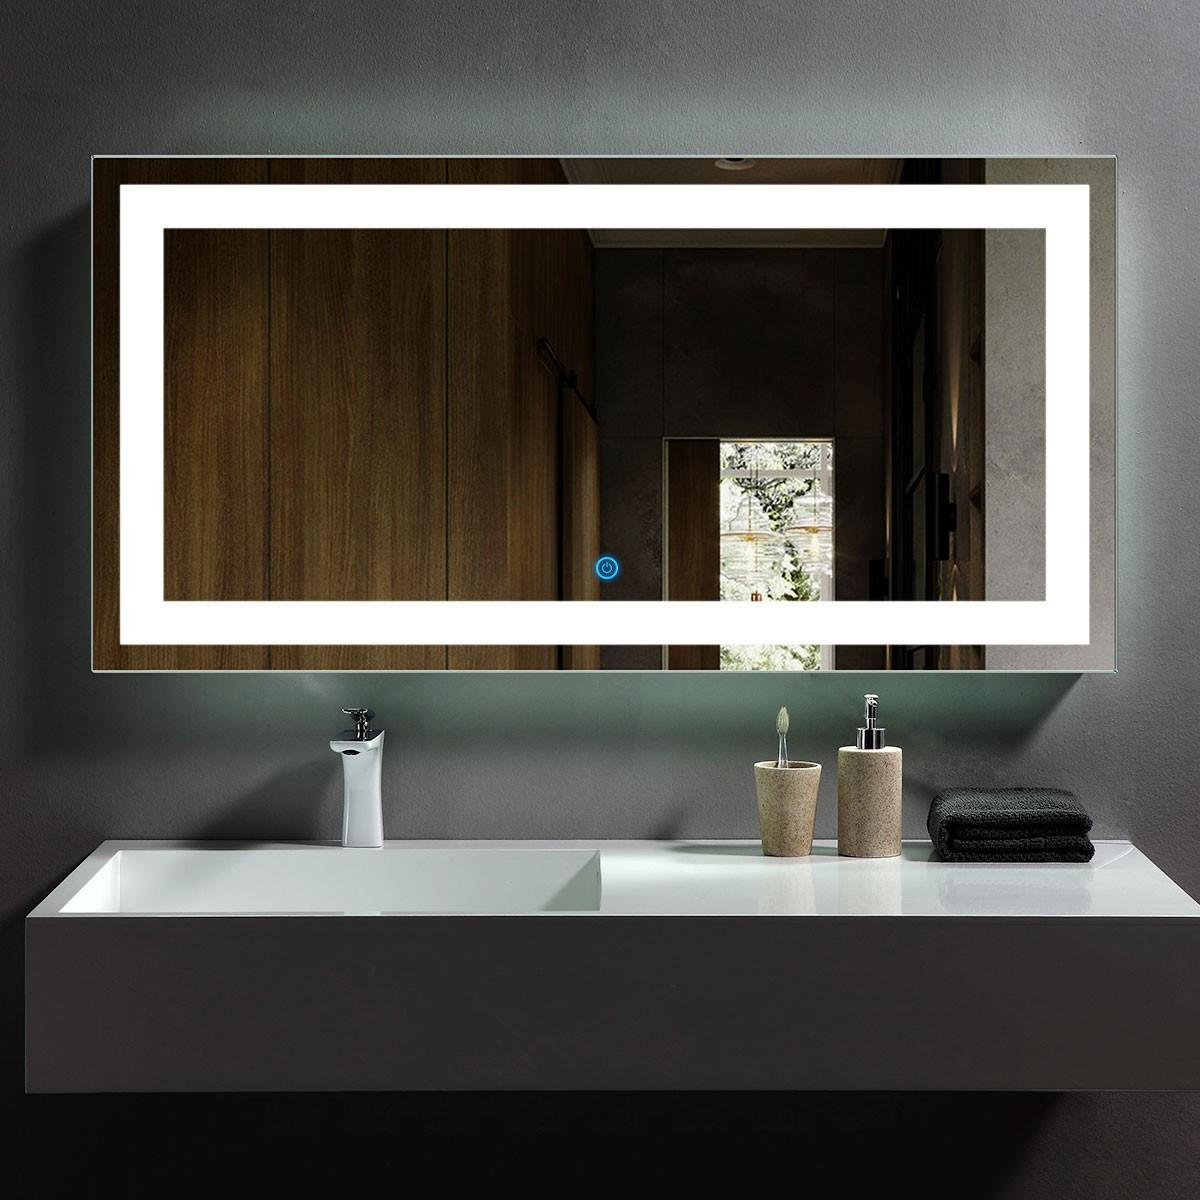 48 x 24 In Horizontal LED Bathroom Mirror, Touch Button (DK-OD-CK010-E)